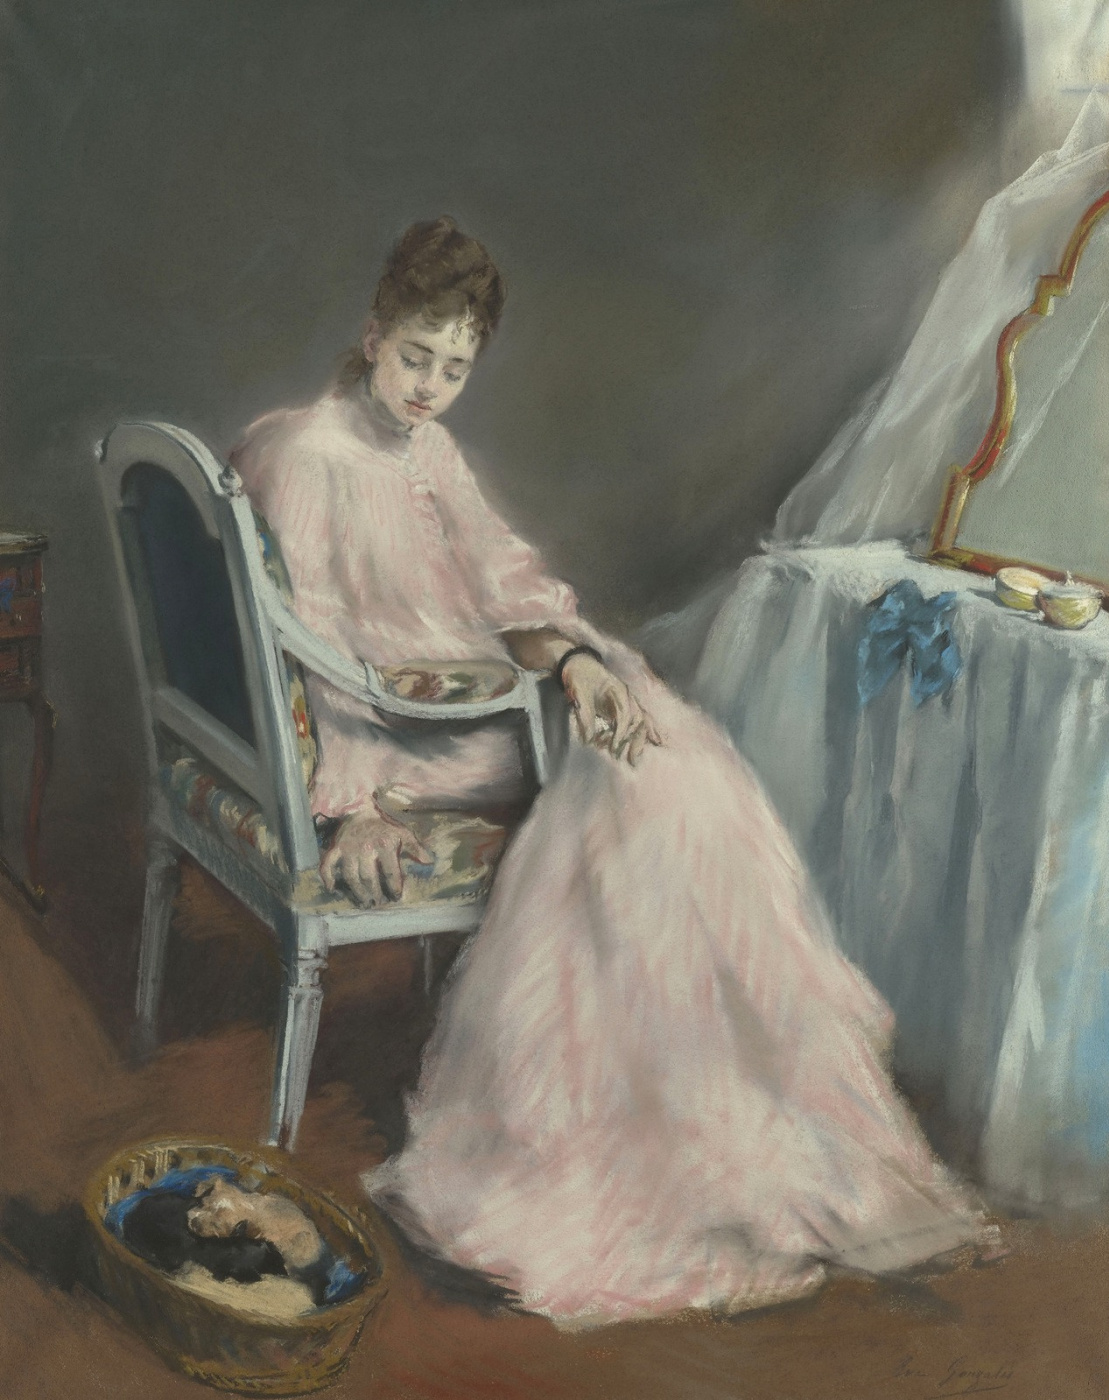 Eva Gonzalez. Woman in white